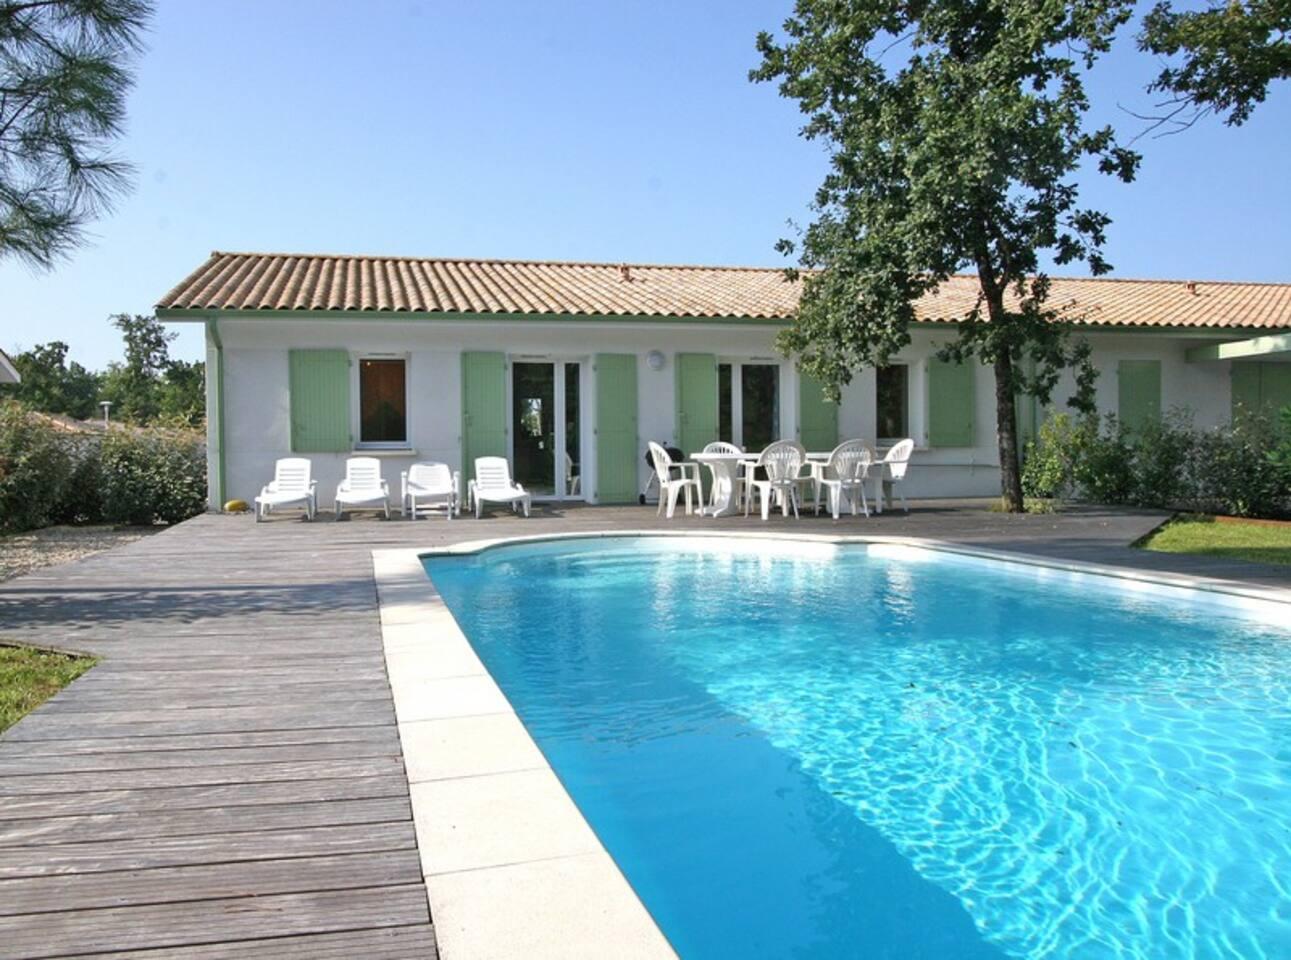 Large sunny terrace around pool